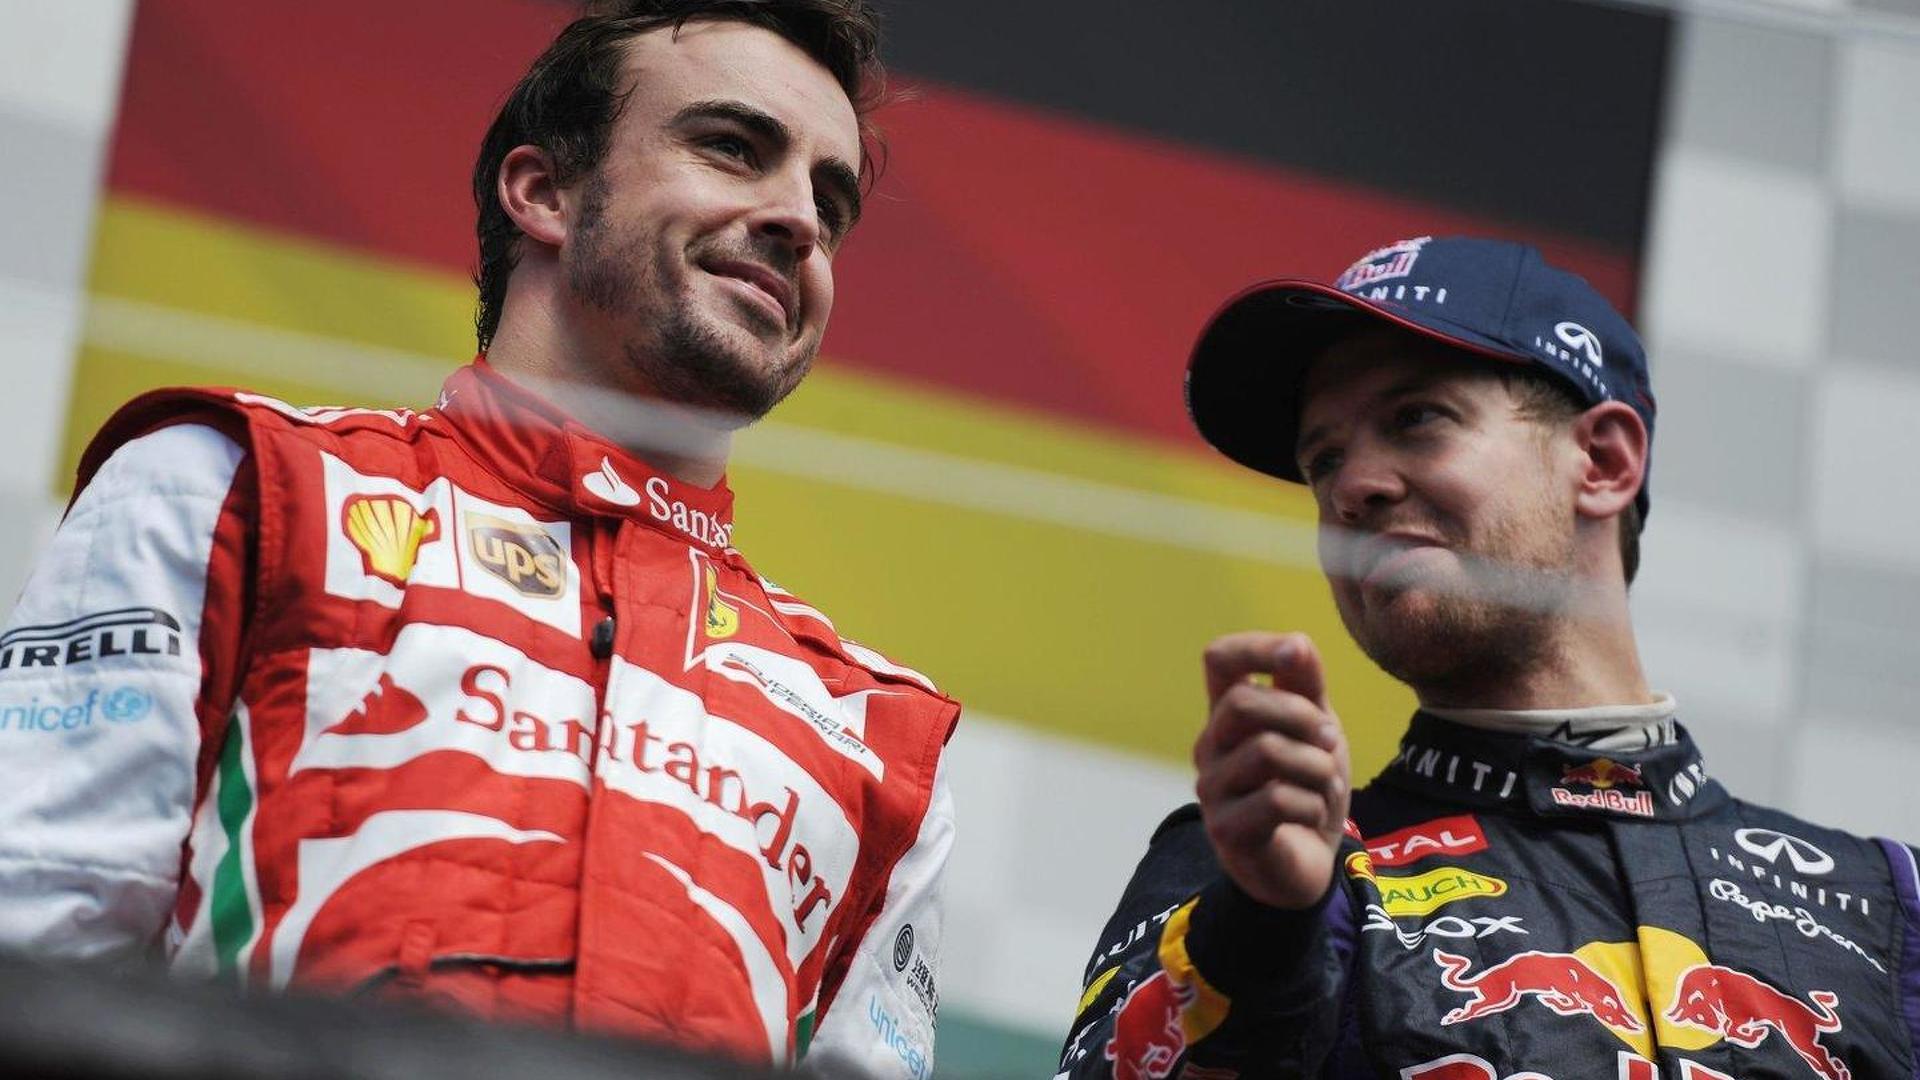 F1 peers split over Vettel versus Alonso question